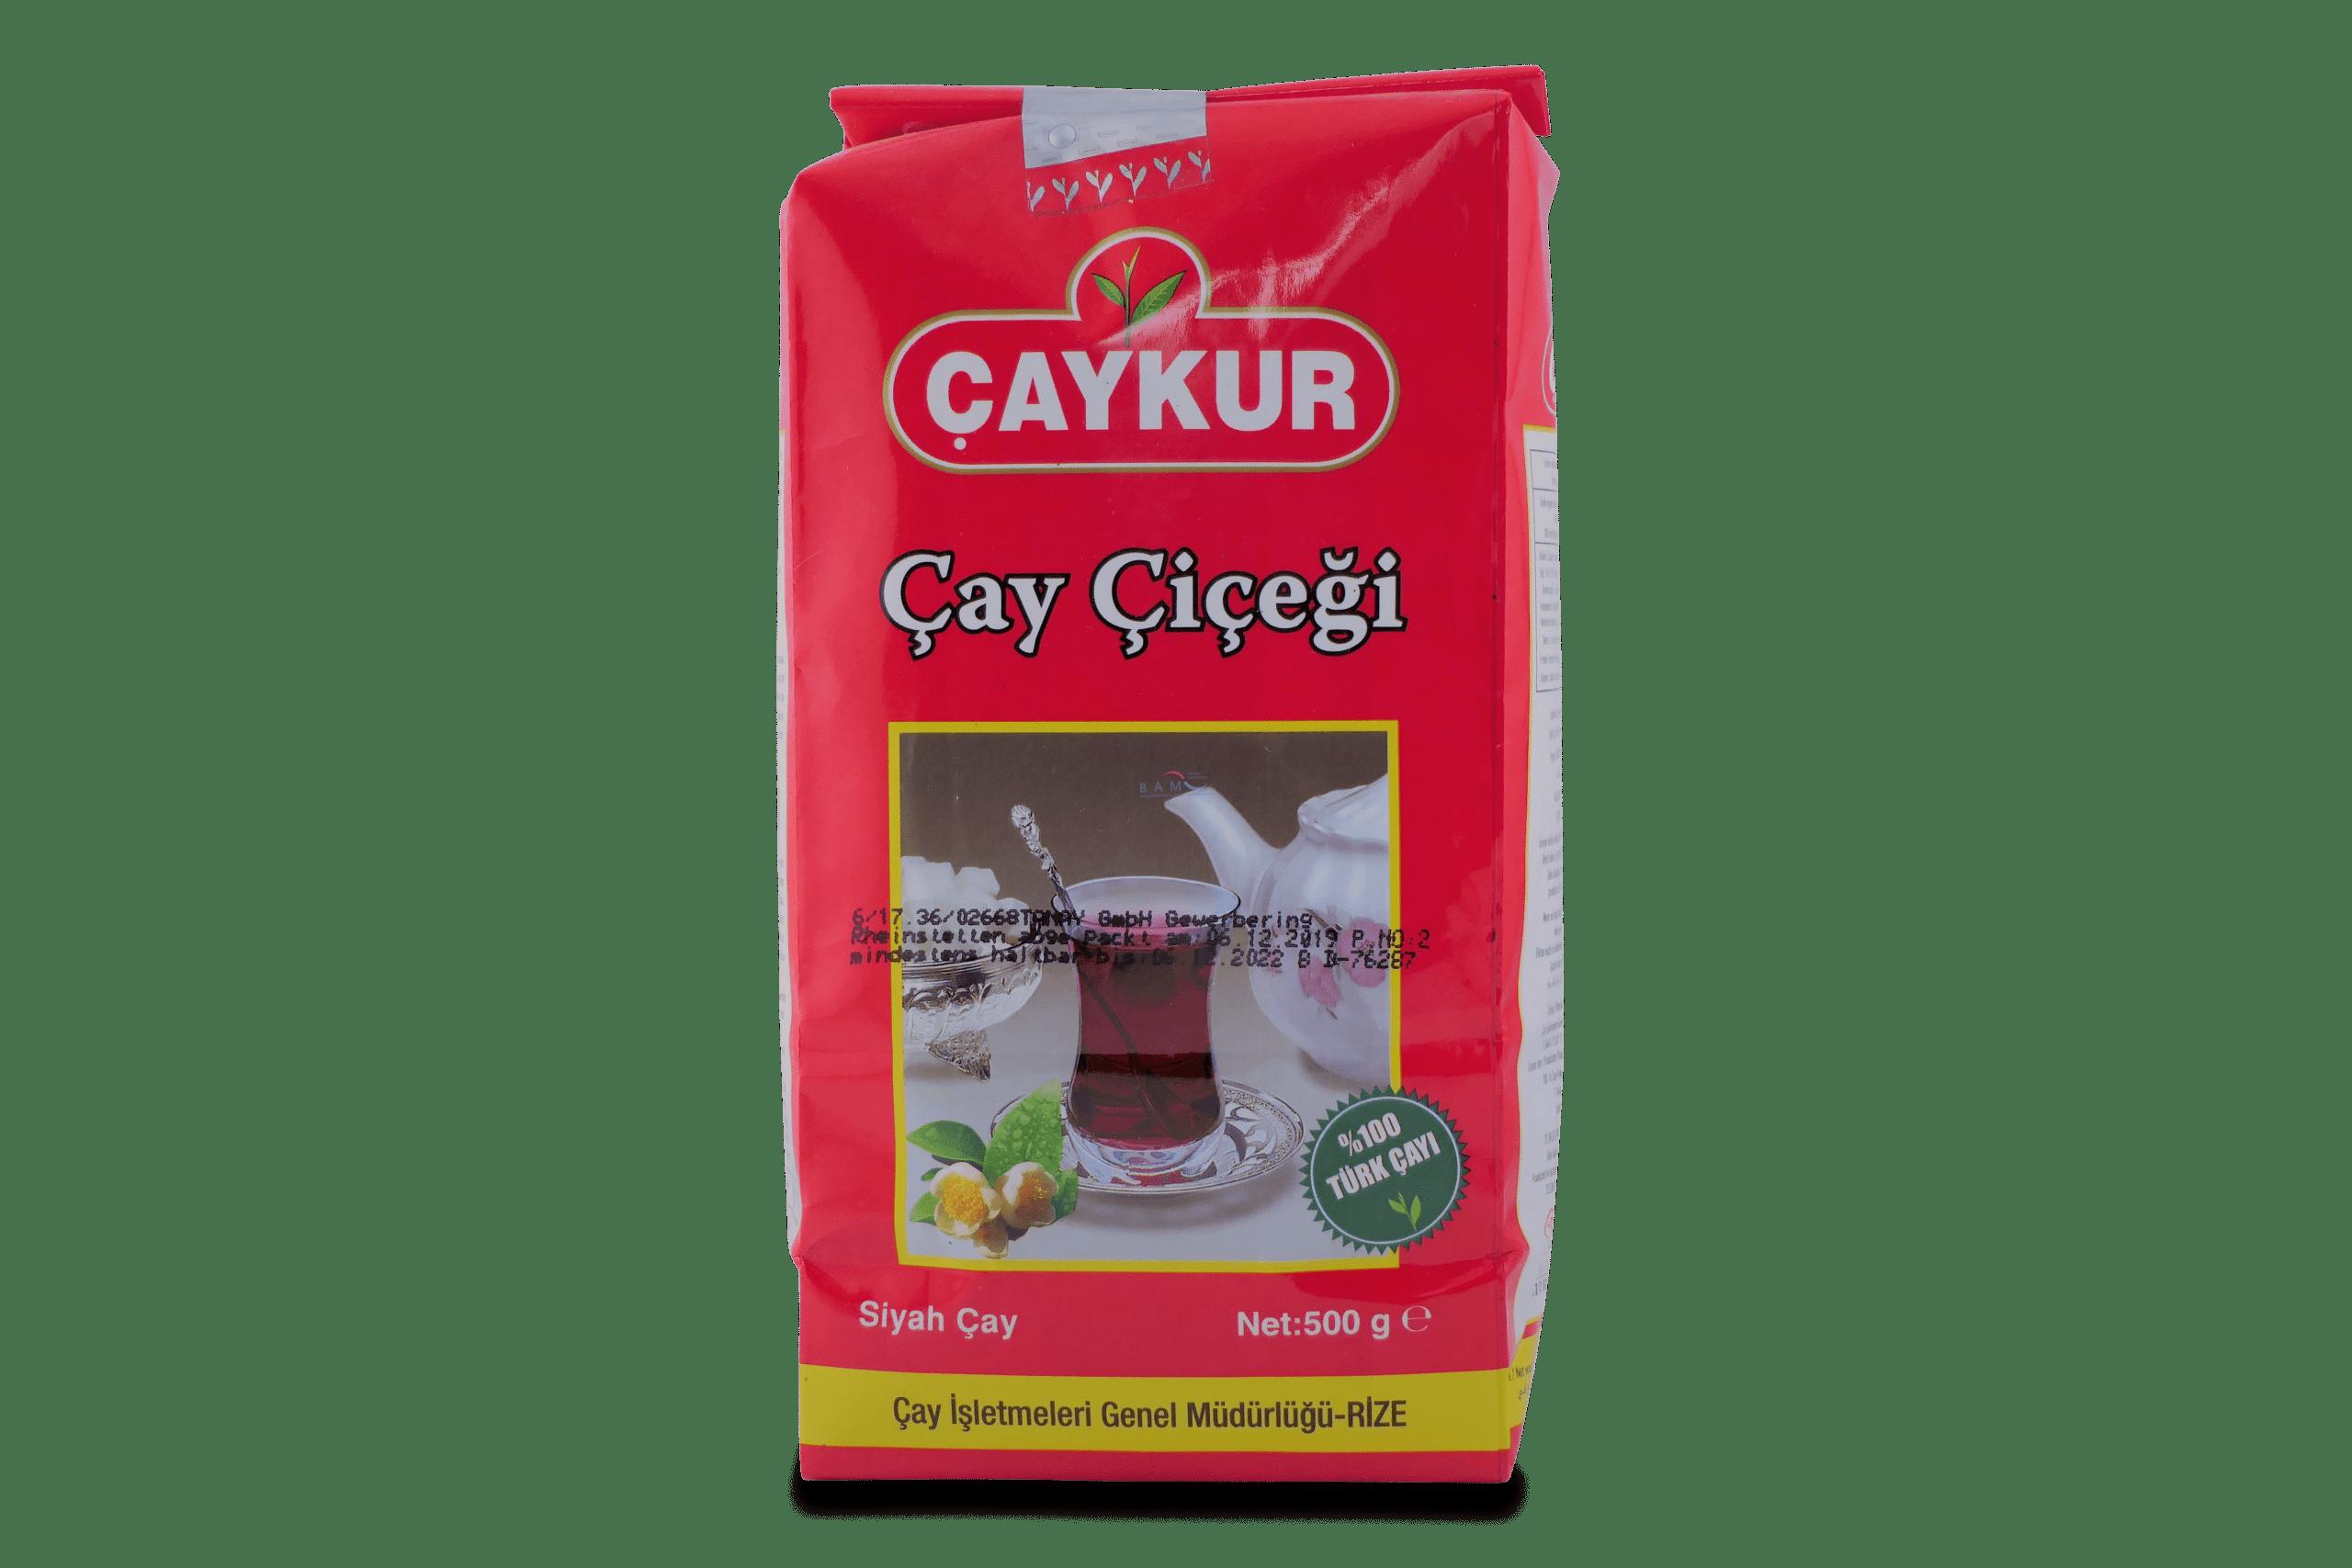 Caykur Cay Cicegi / Teeblume 500g